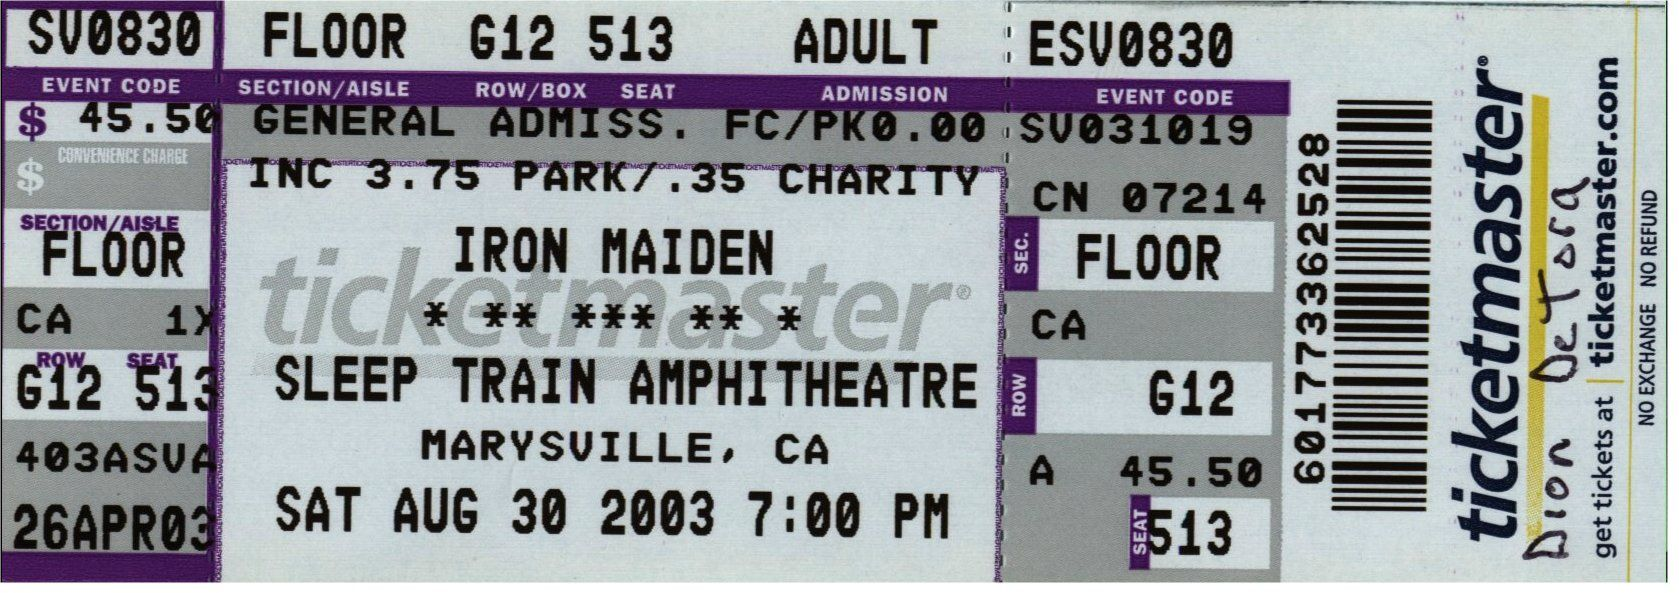 20030830 Ticket 1679x593